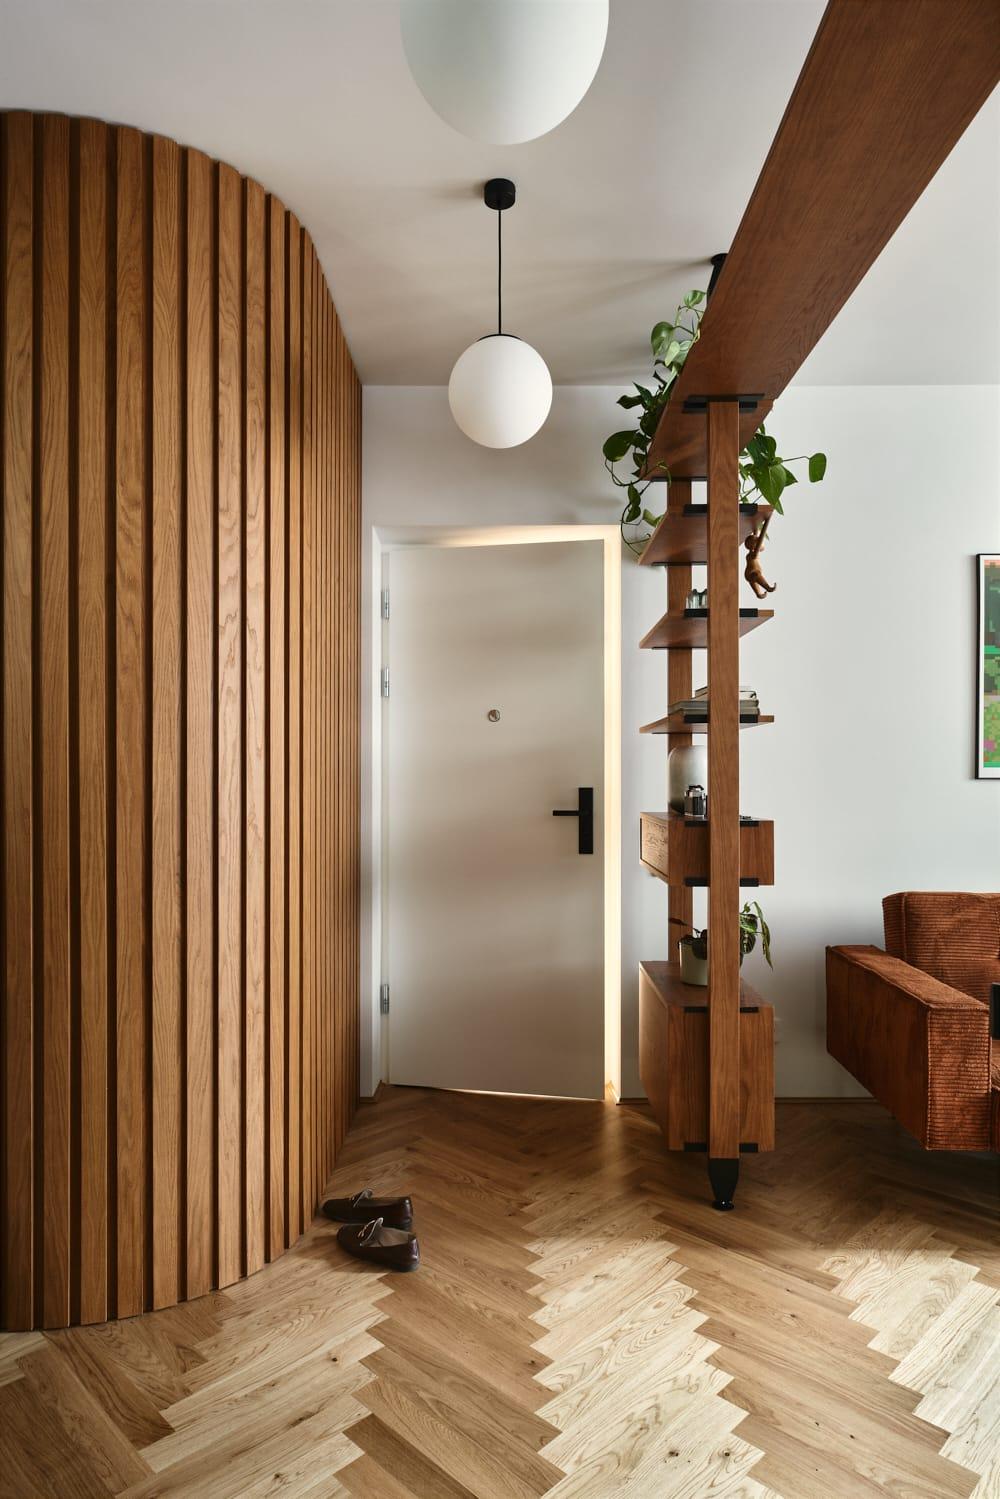 yarmush-interiors-inarchitekci-200925131237-08204